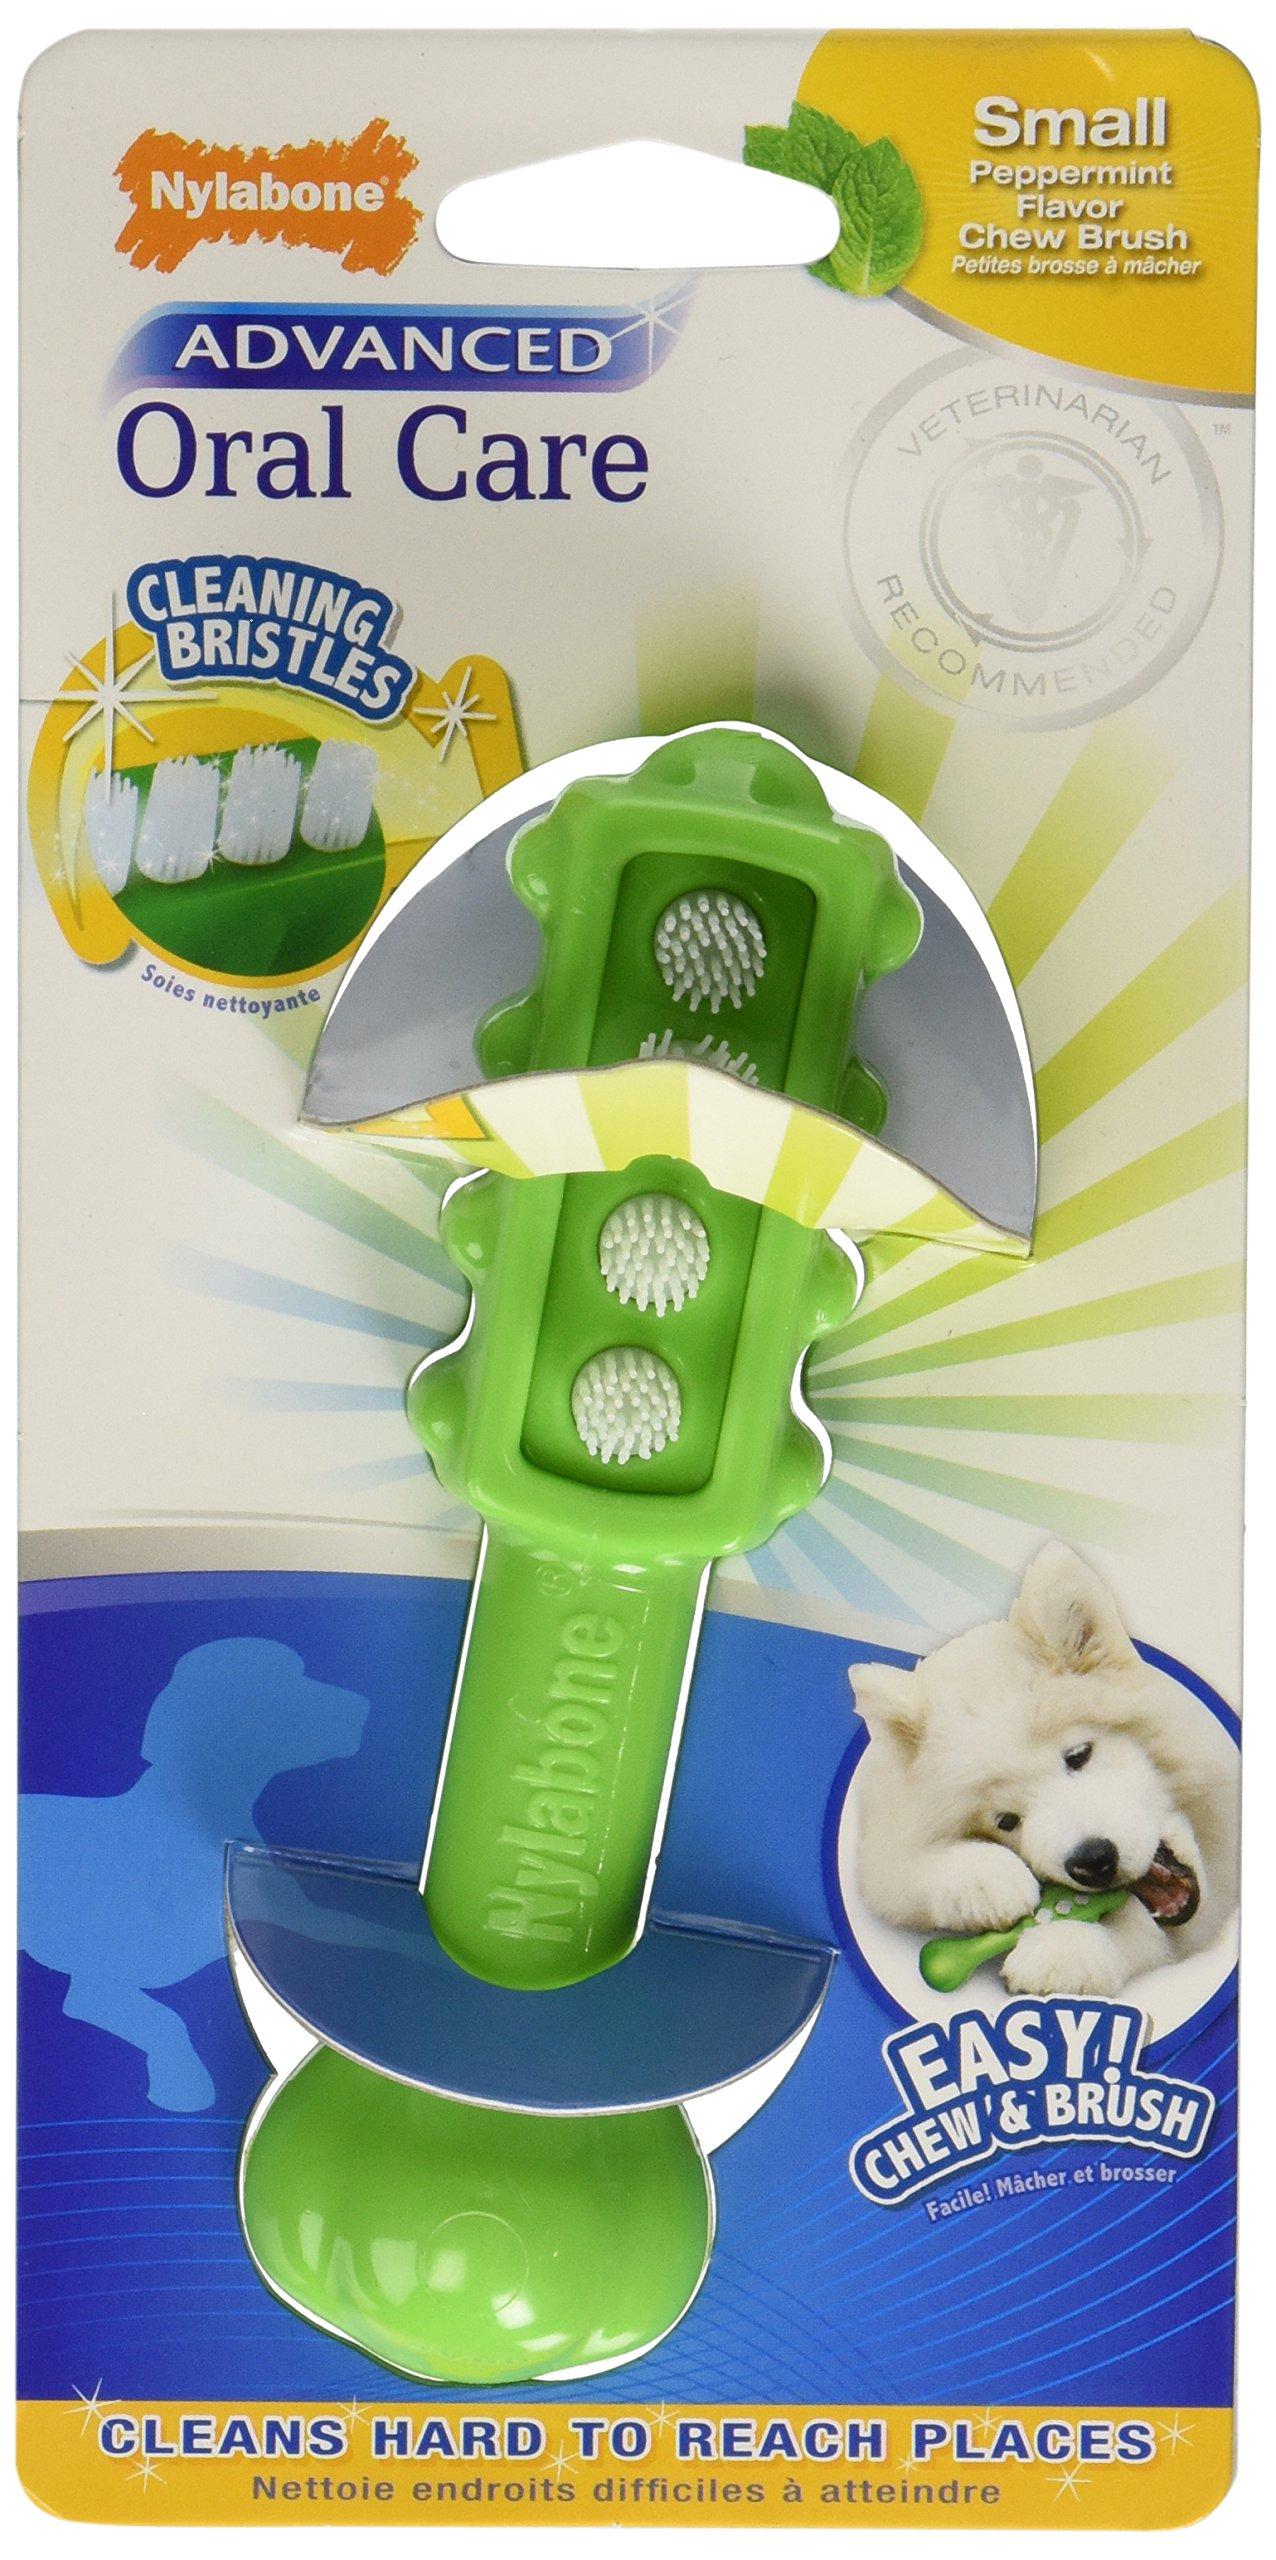 Nylabone Advanced Oral Care Dental Dog Brush, Small